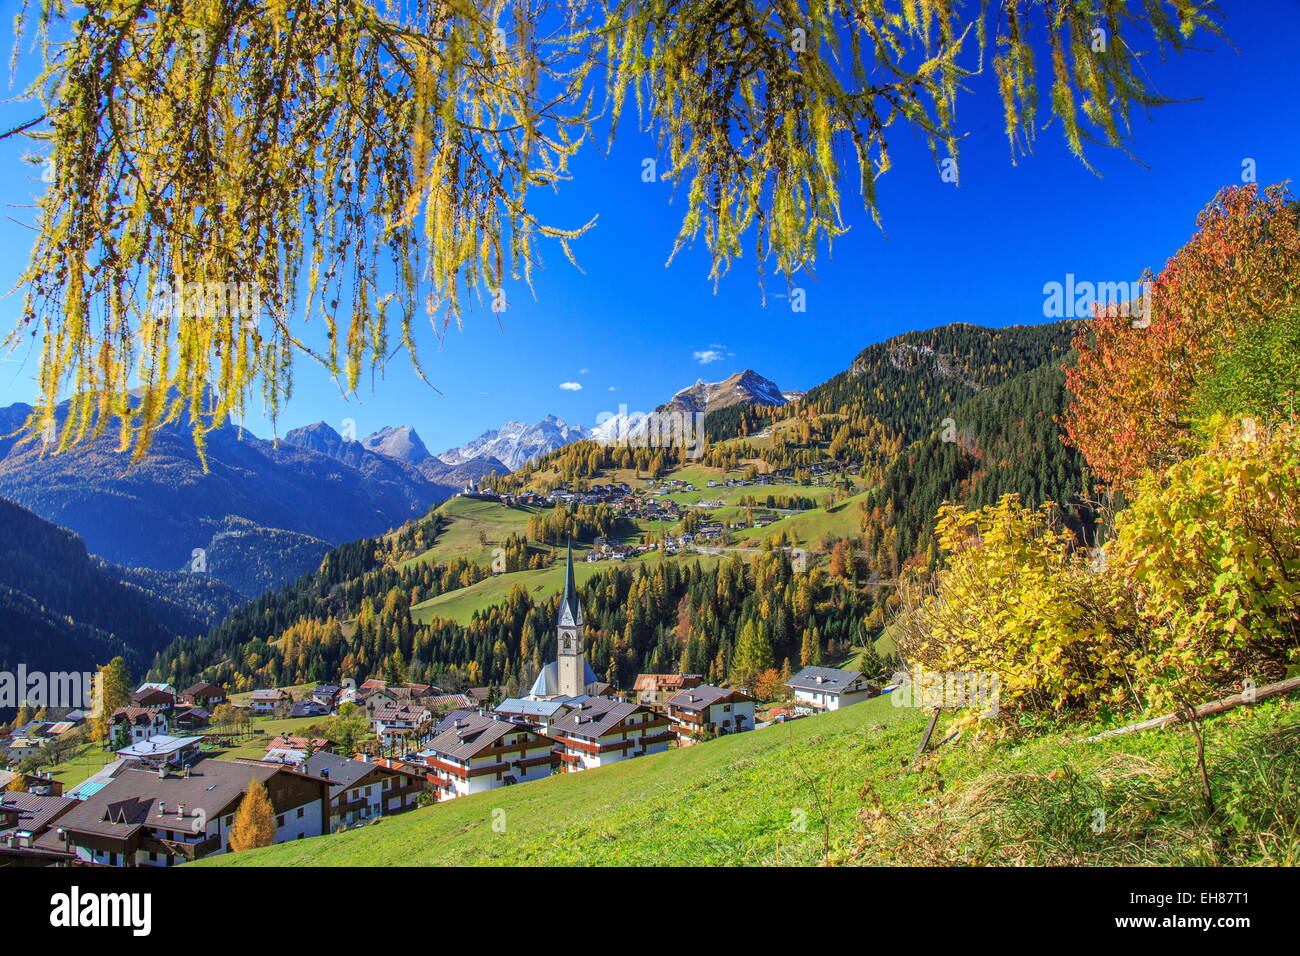 The villages of Selva di Cadore and Colle Santa Lucia, in the Dolomitic Cadore Region, Veneto, Italy - Stock Image